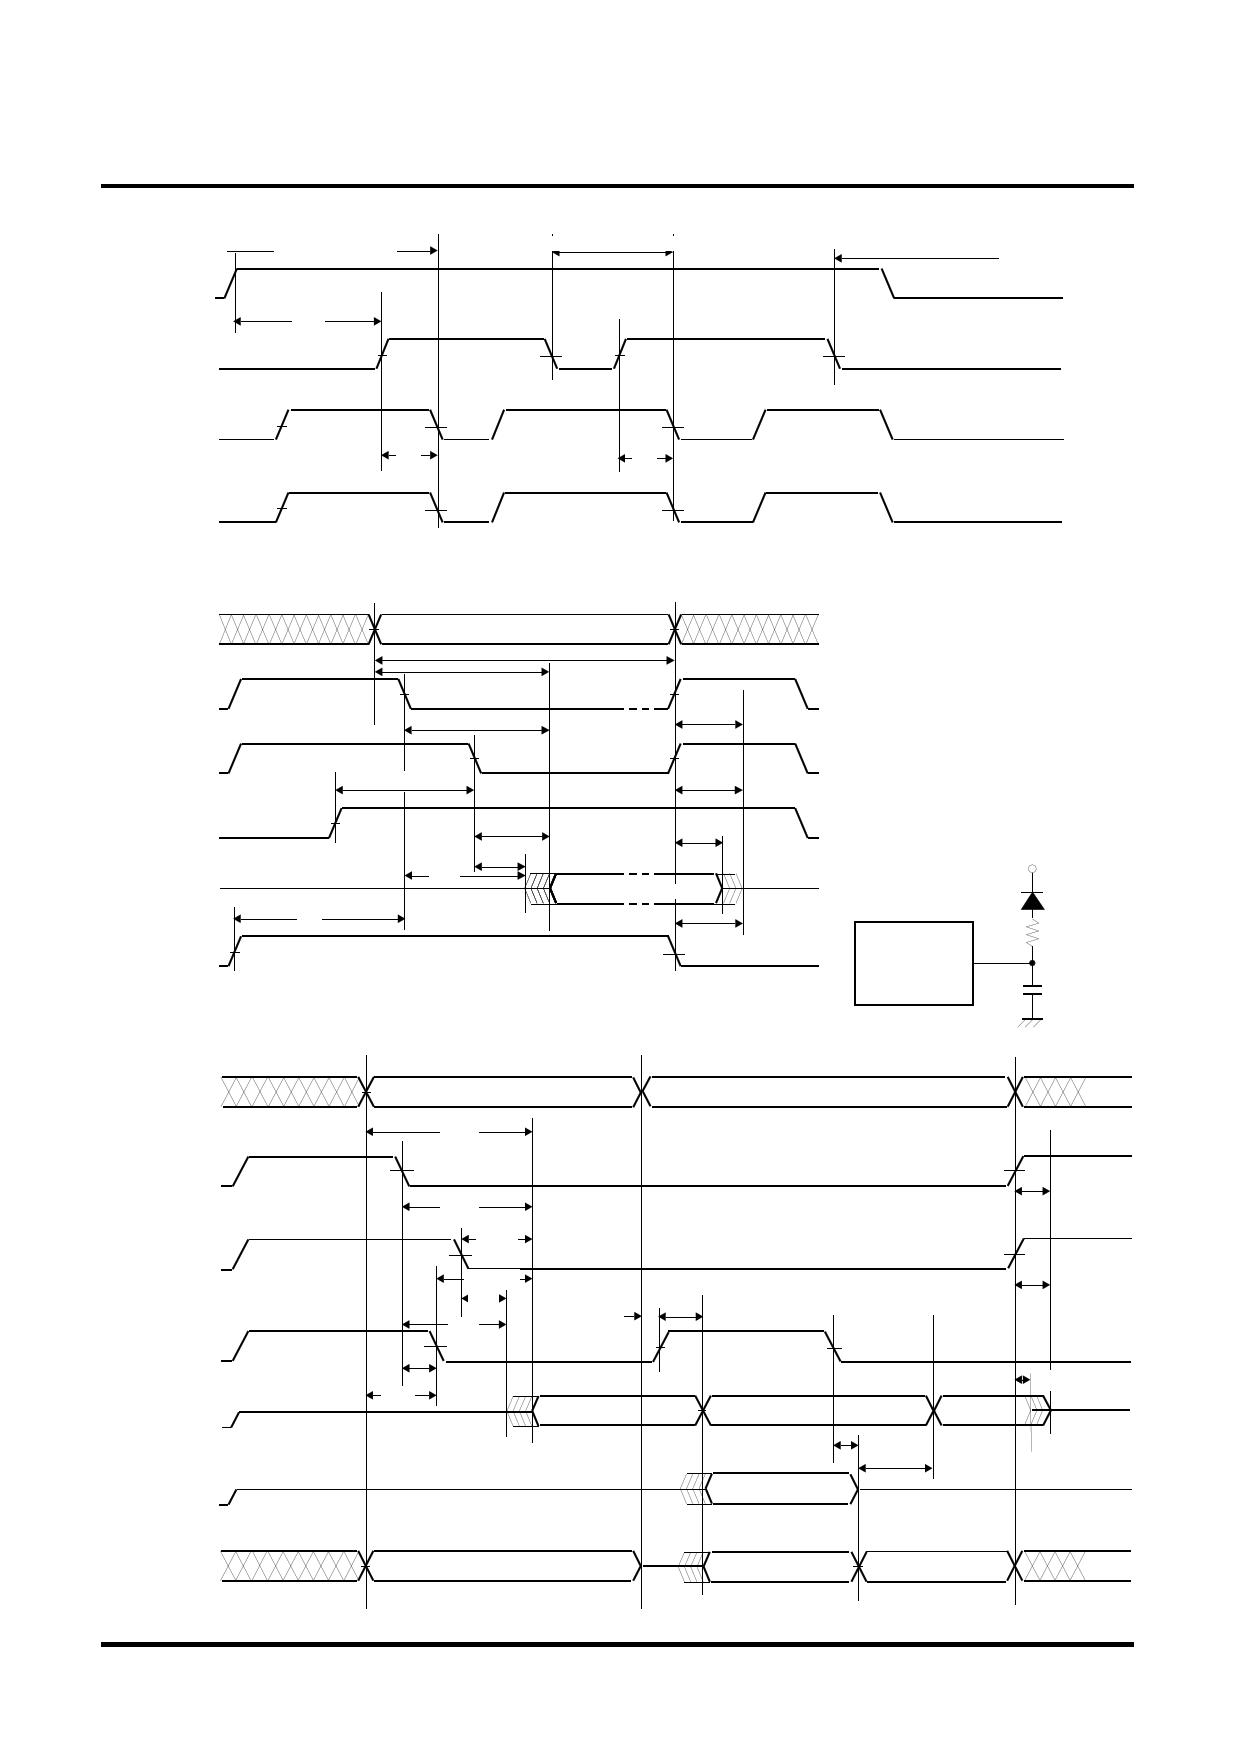 M5M29FB800RV-80 transistor, diode fet, igbt, scr